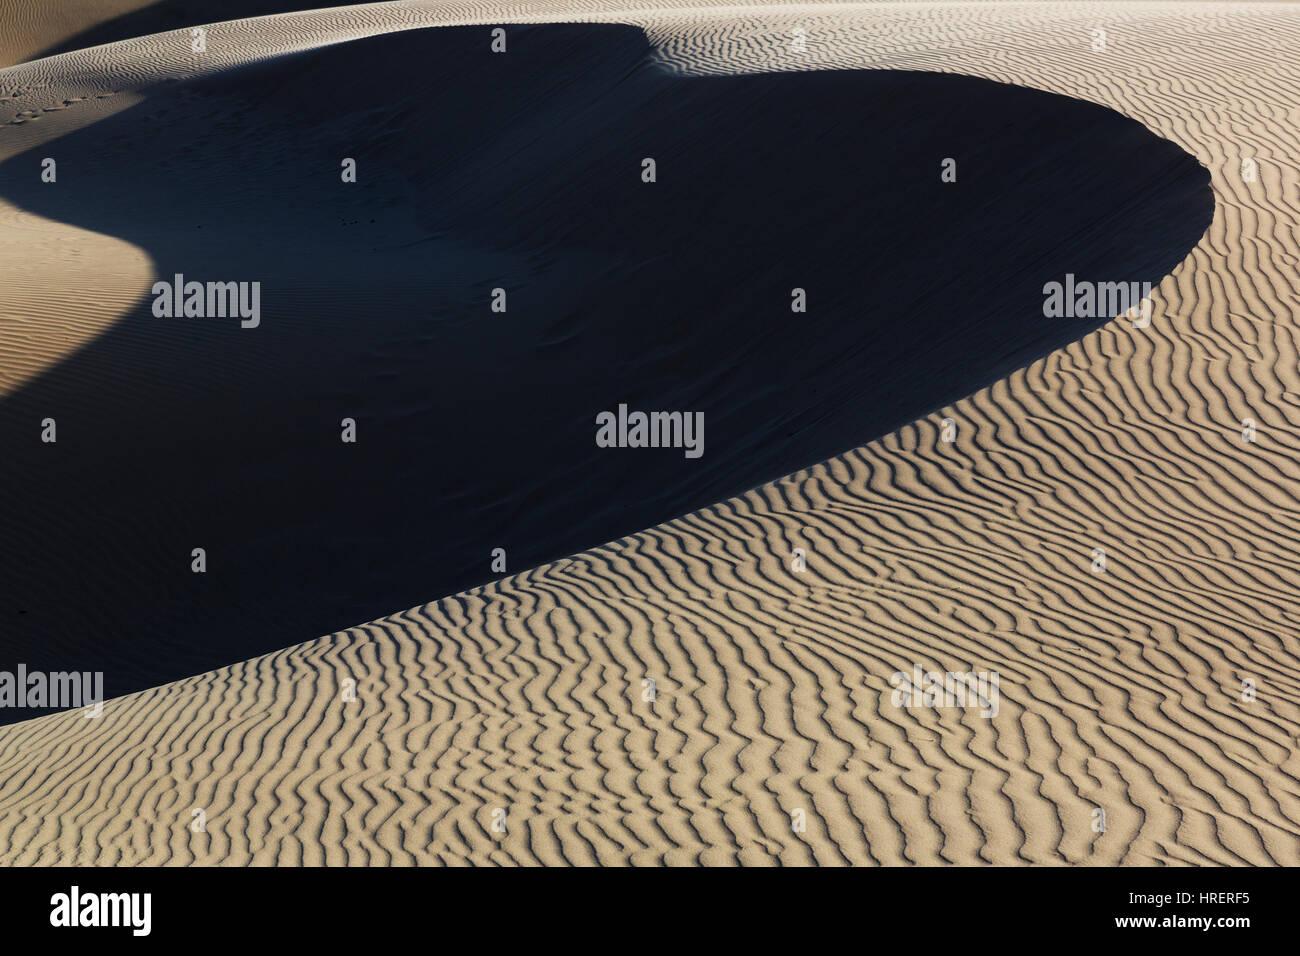 Oceano dune naturali preservare, California Immagini Stock